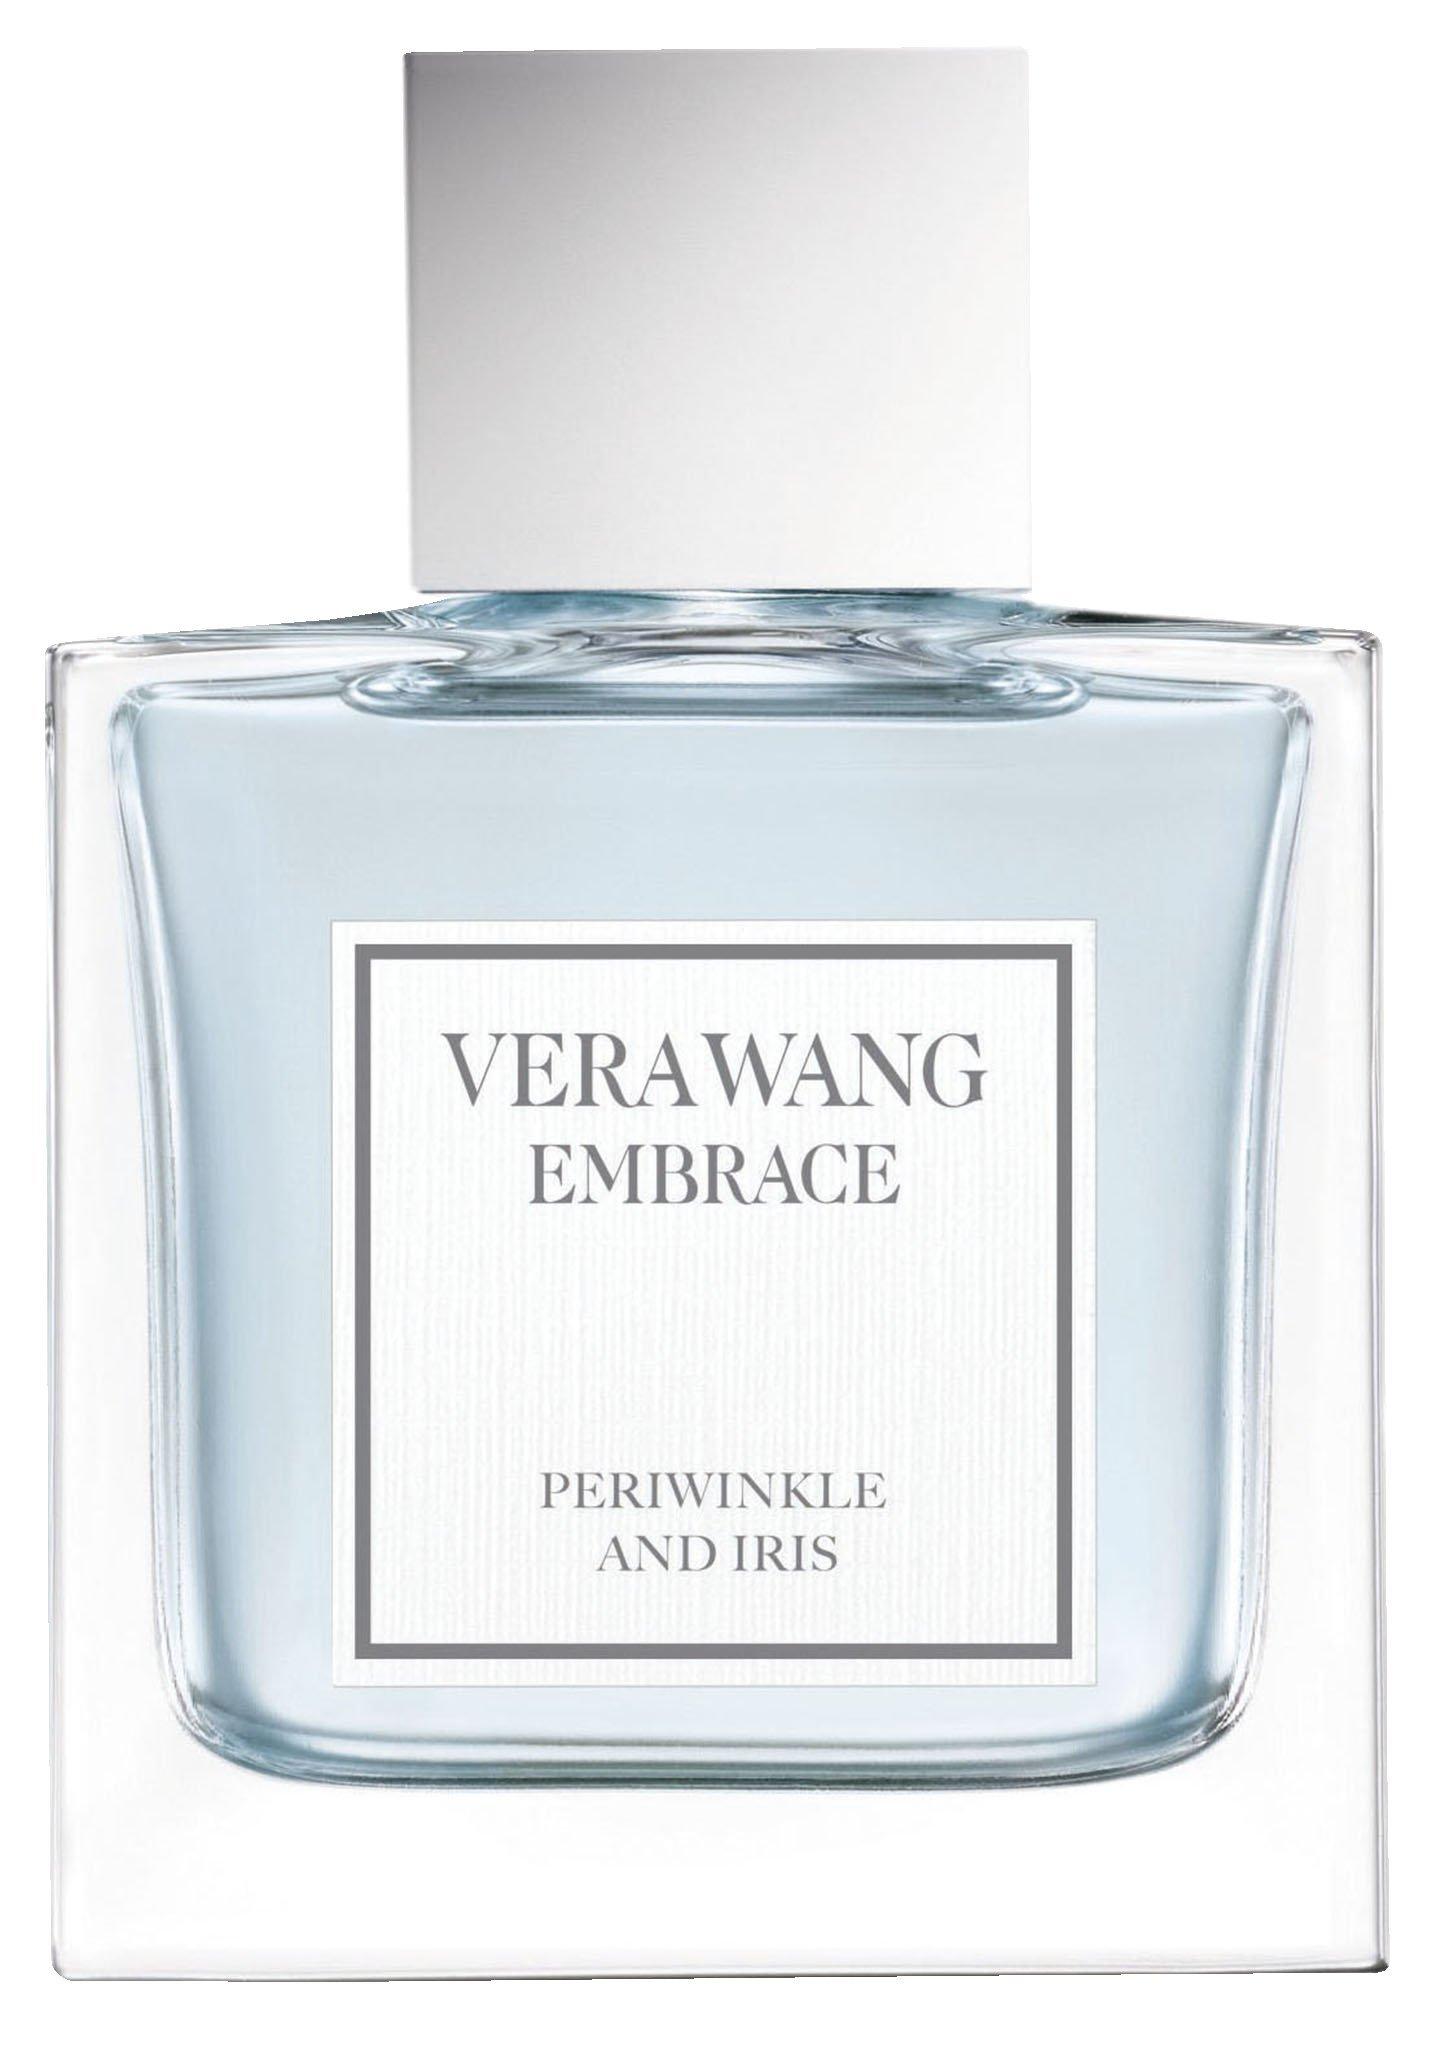 Vera Wang Embrace Eau de Toilette Periwinkle and Iris Scent 1 Fluid Oz. Women's Cologne Passionate, Floral and Sparkling Fragrance by Vera Wang (Image #2)